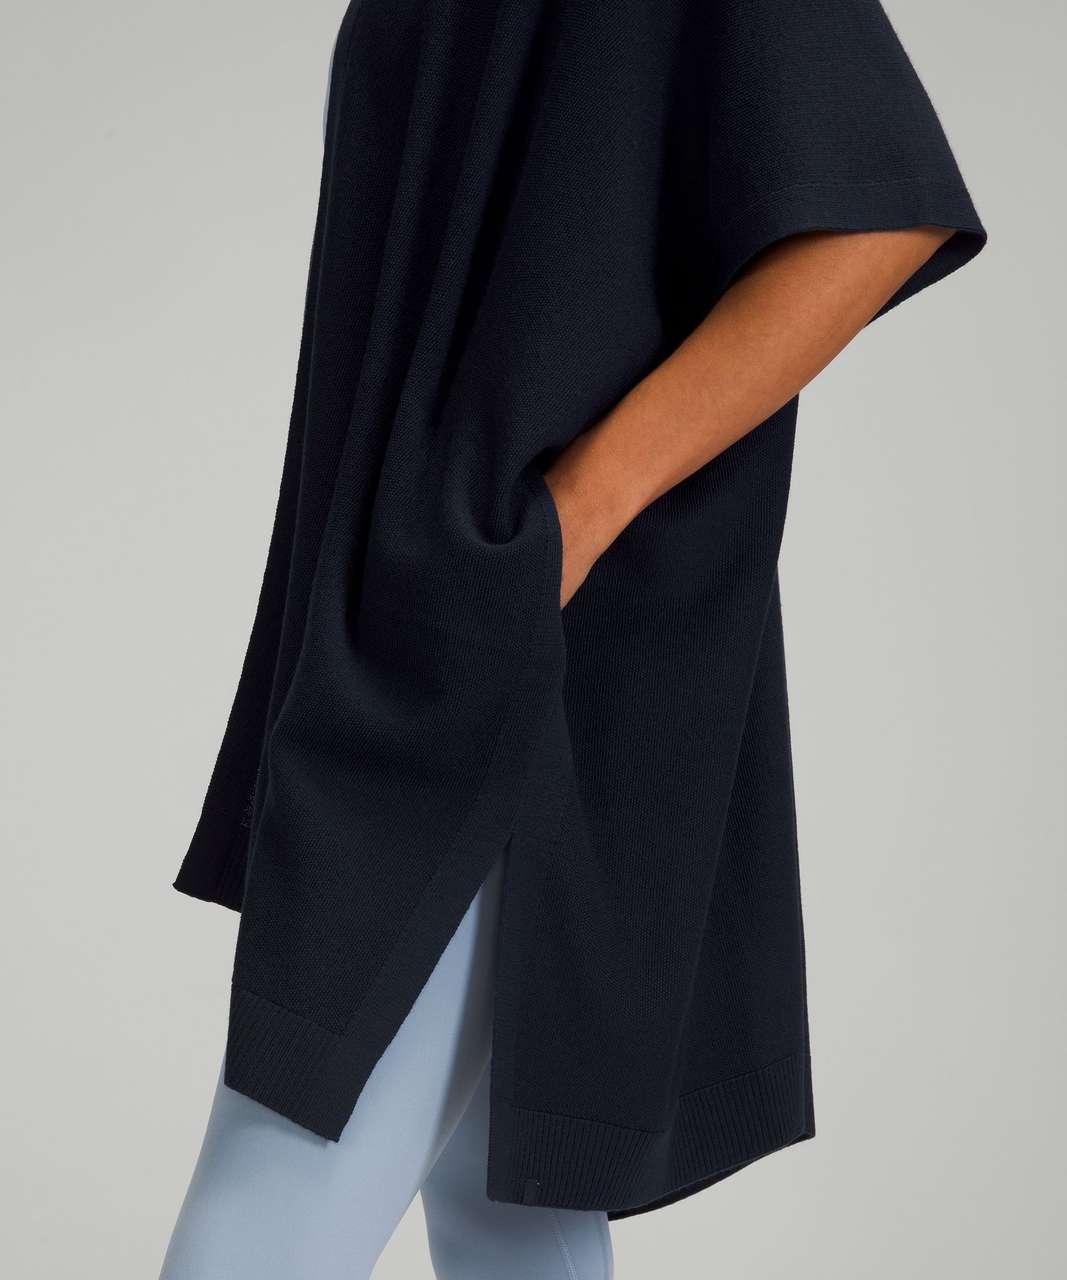 Lululemon Merino Wool Short Sleeve Wrap - True Navy